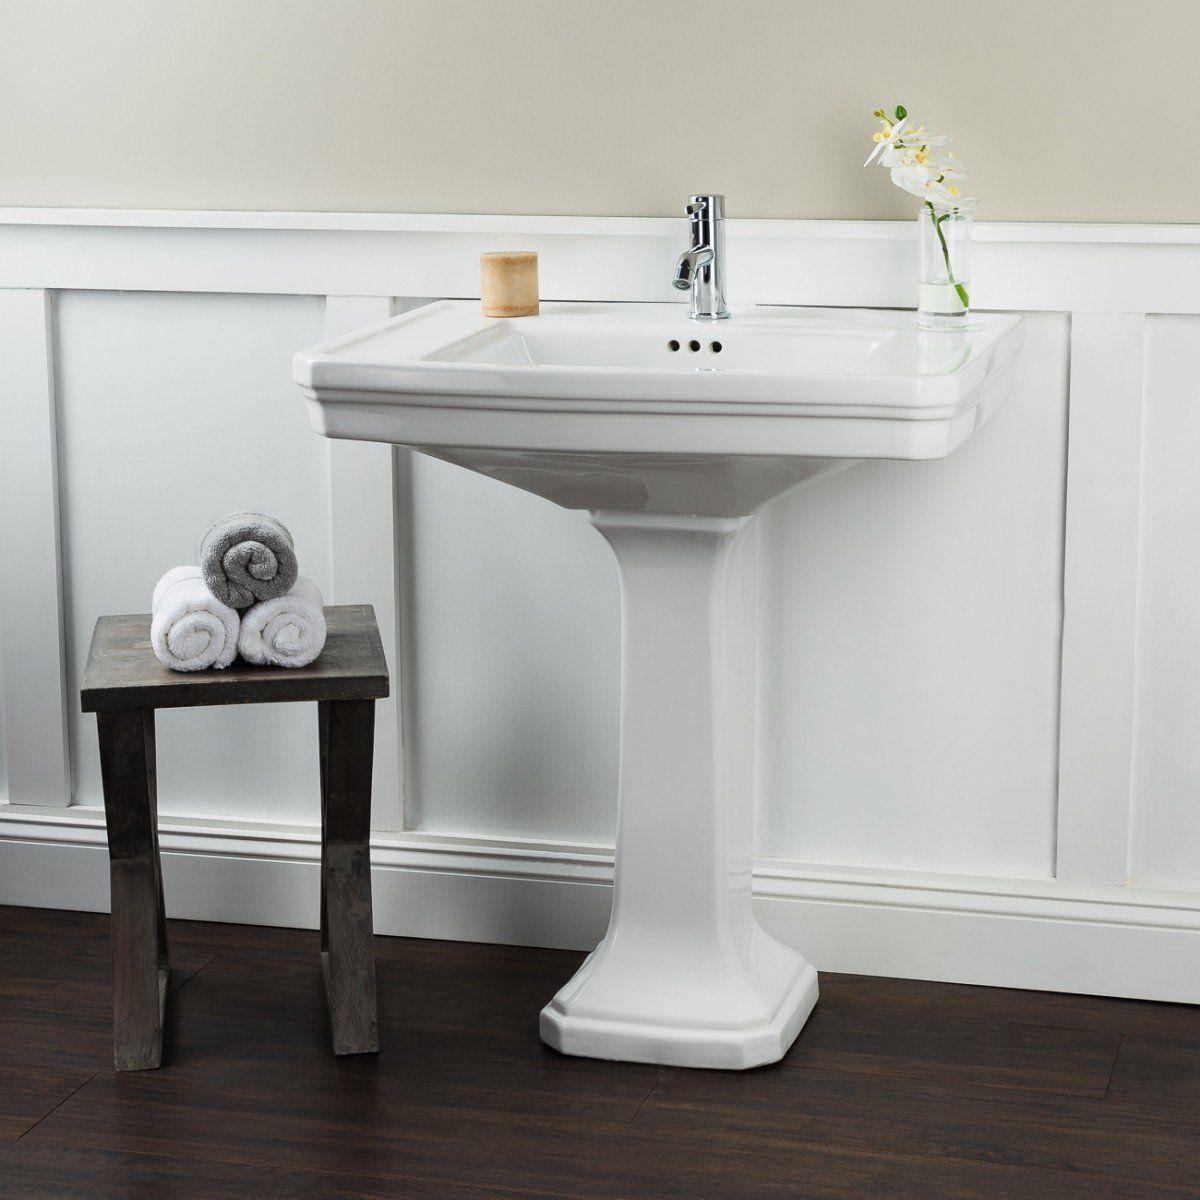 30 Inch Pedestal Sink With Images Pedestal Sink Bathroom